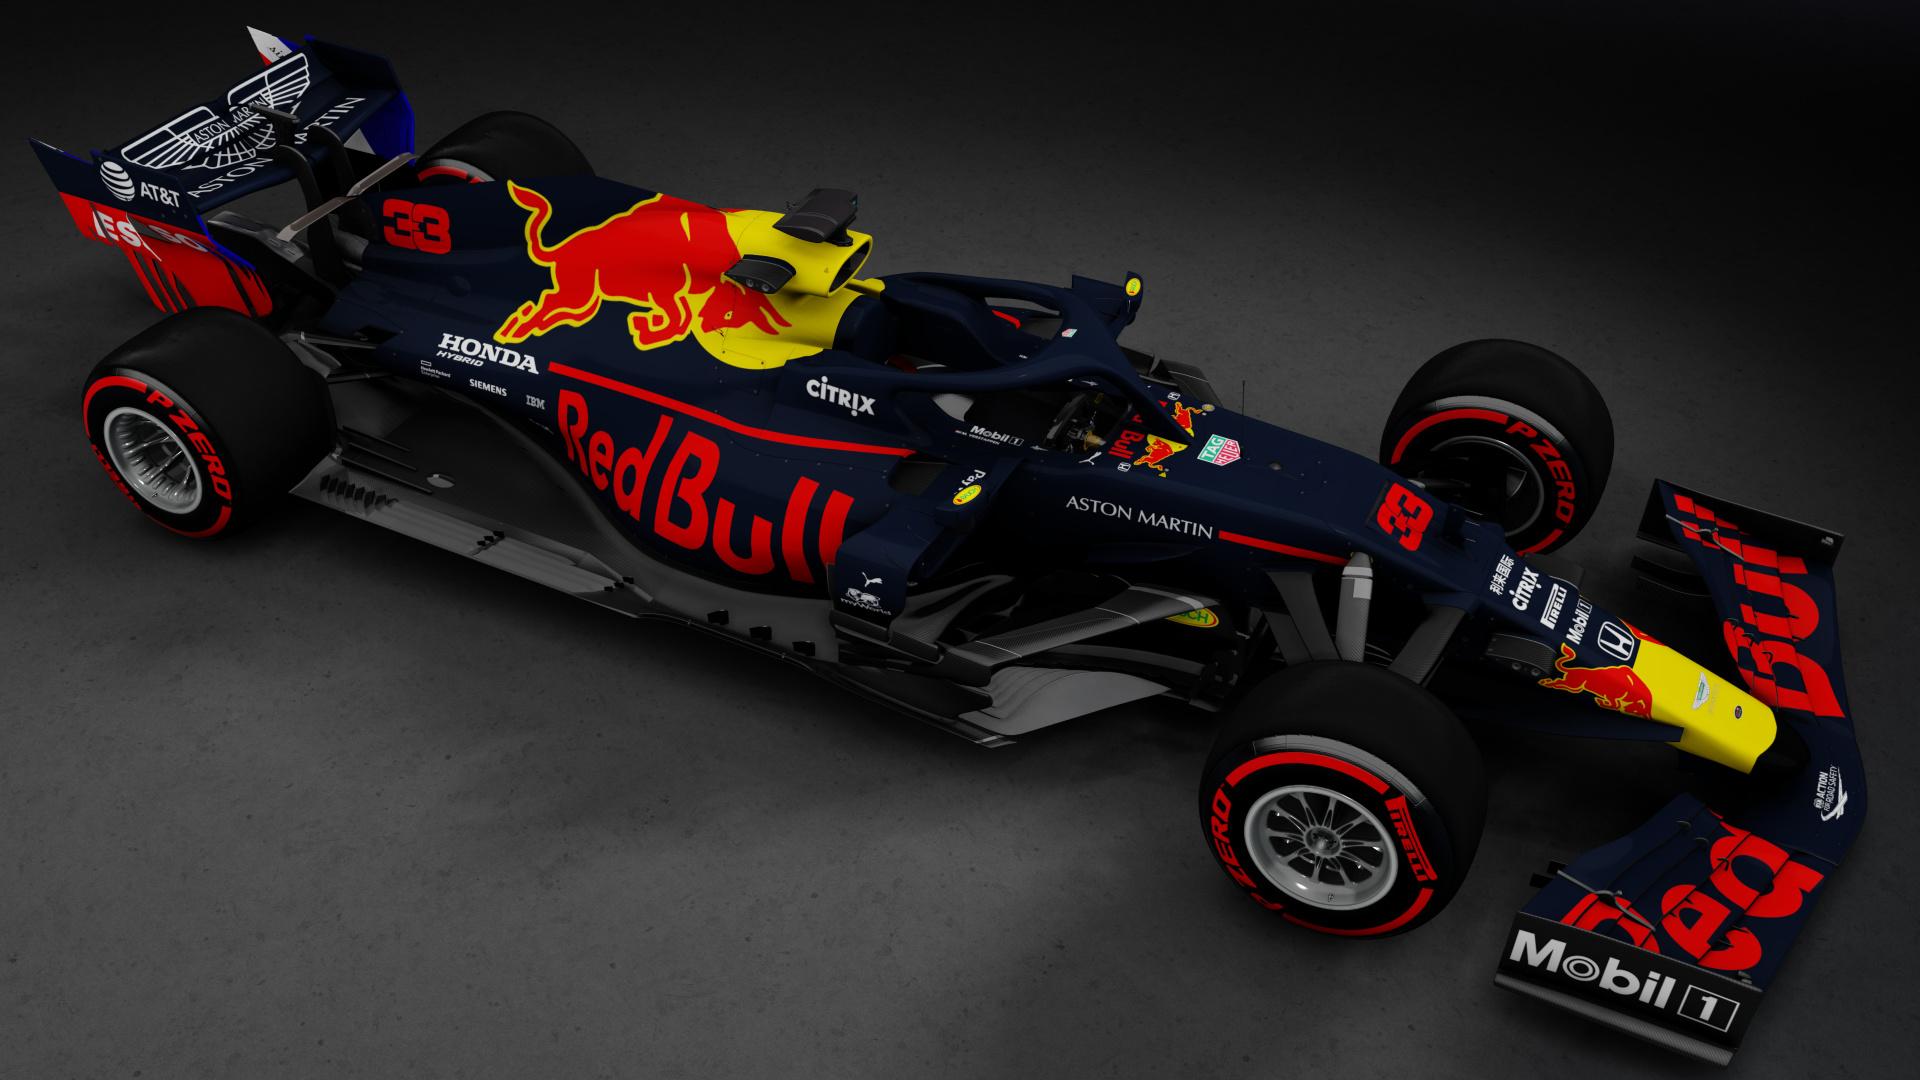 Rss Formula Hybrid 2019 Aston Martin Red Bull 2020 Racedepartment